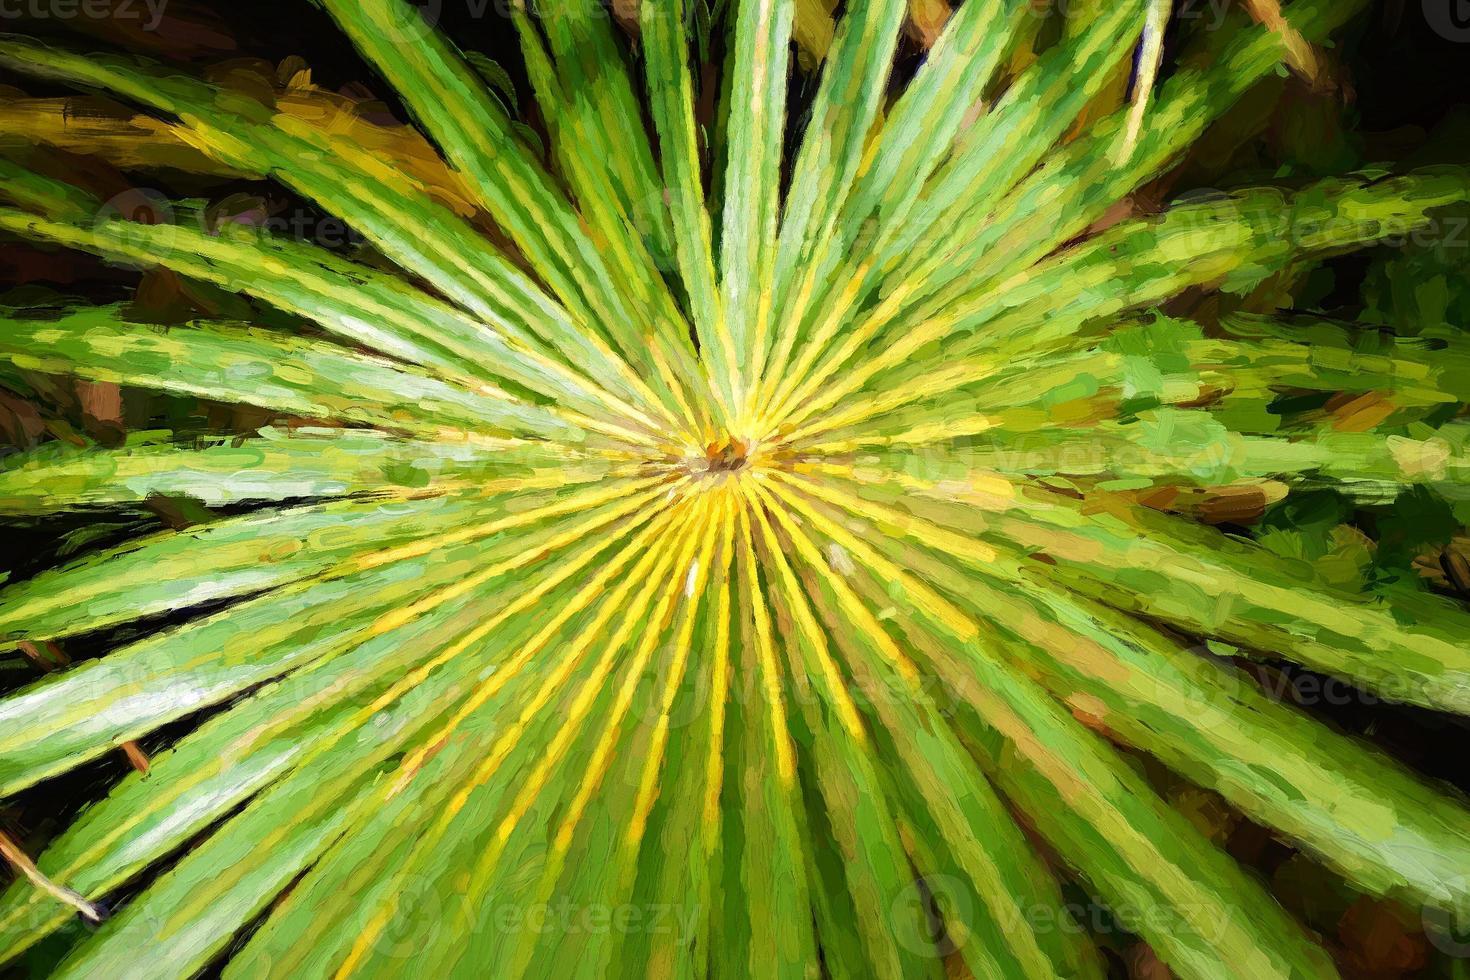 digital konst, abstrakt tropisk natur: exotiskt grönt palmblad foto